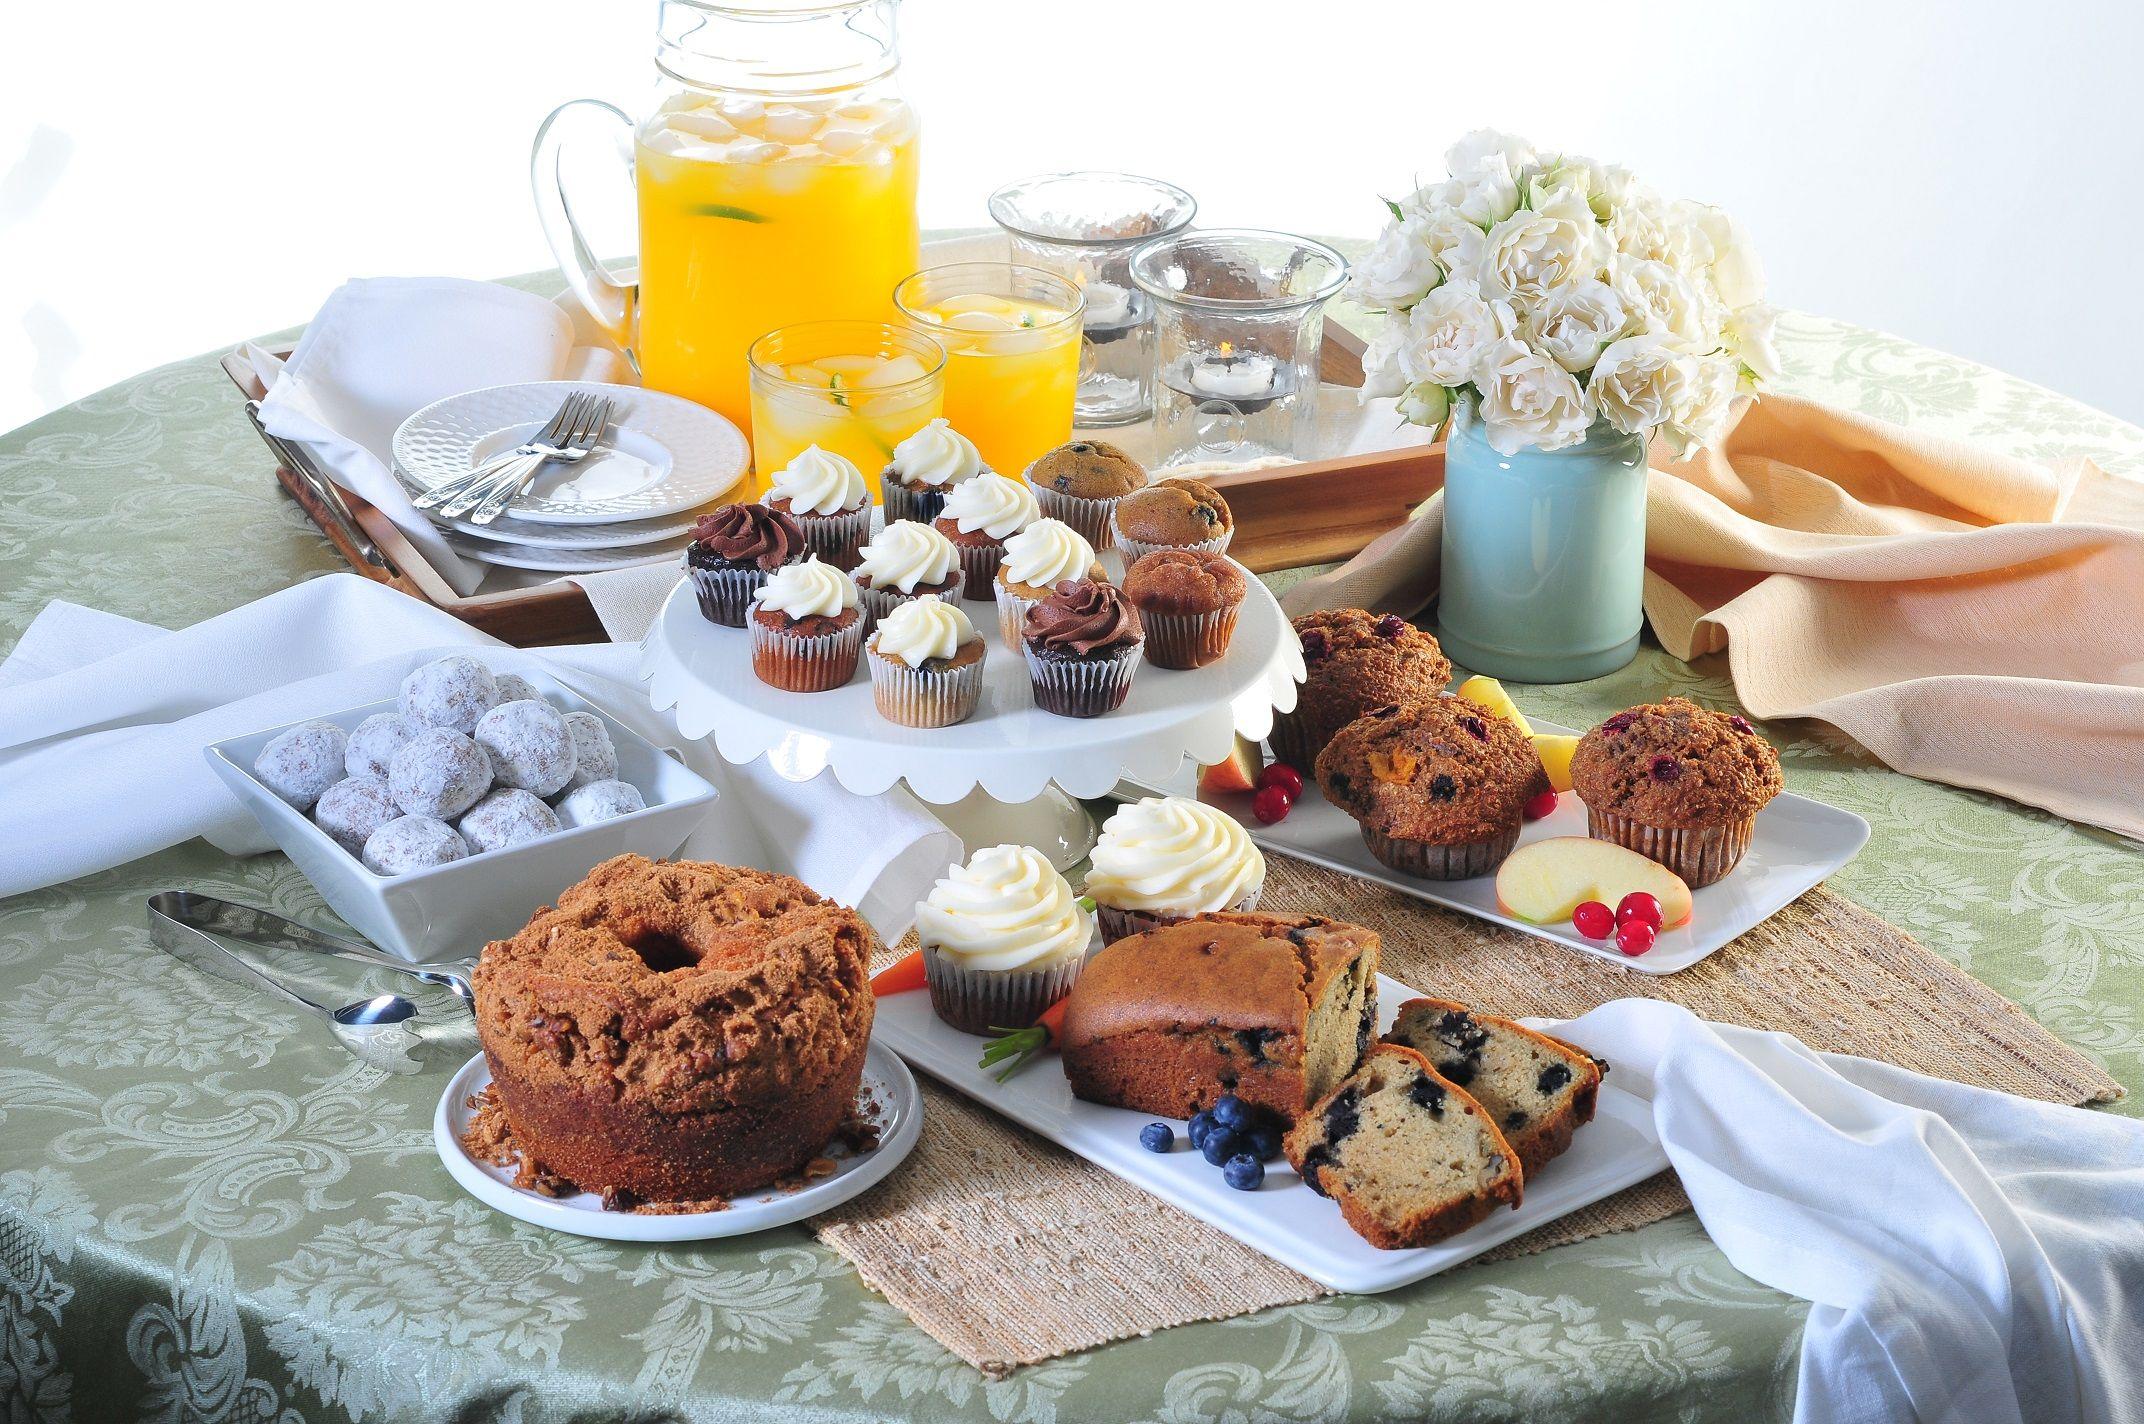 The most delicious vegan picnic! Vegan bakery, Baking